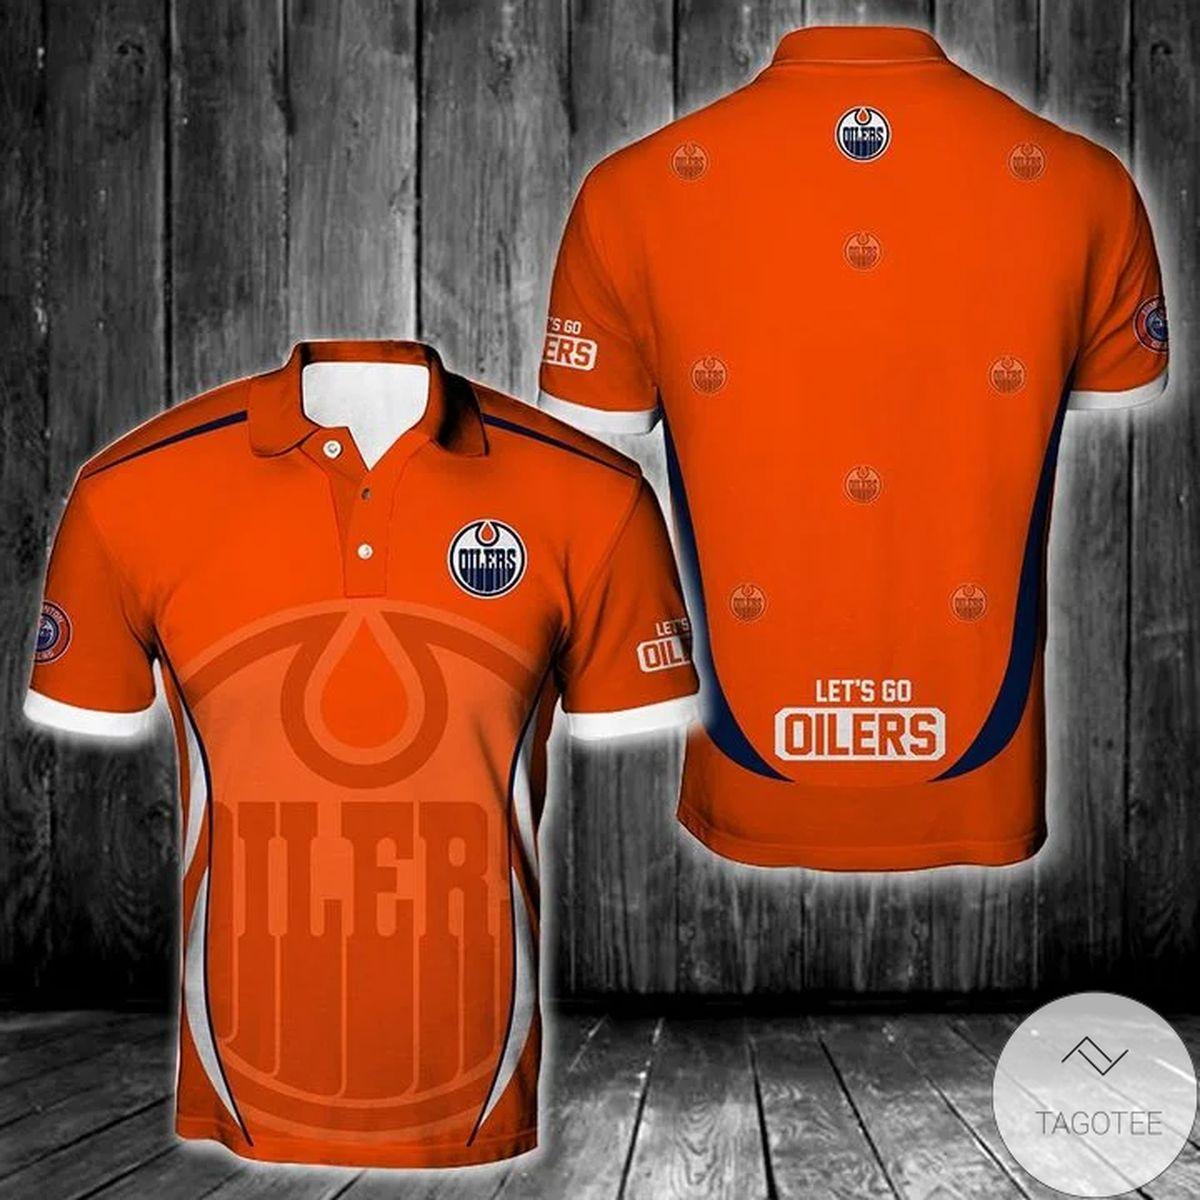 Nhl Edmonton Oilers Polo Shirt